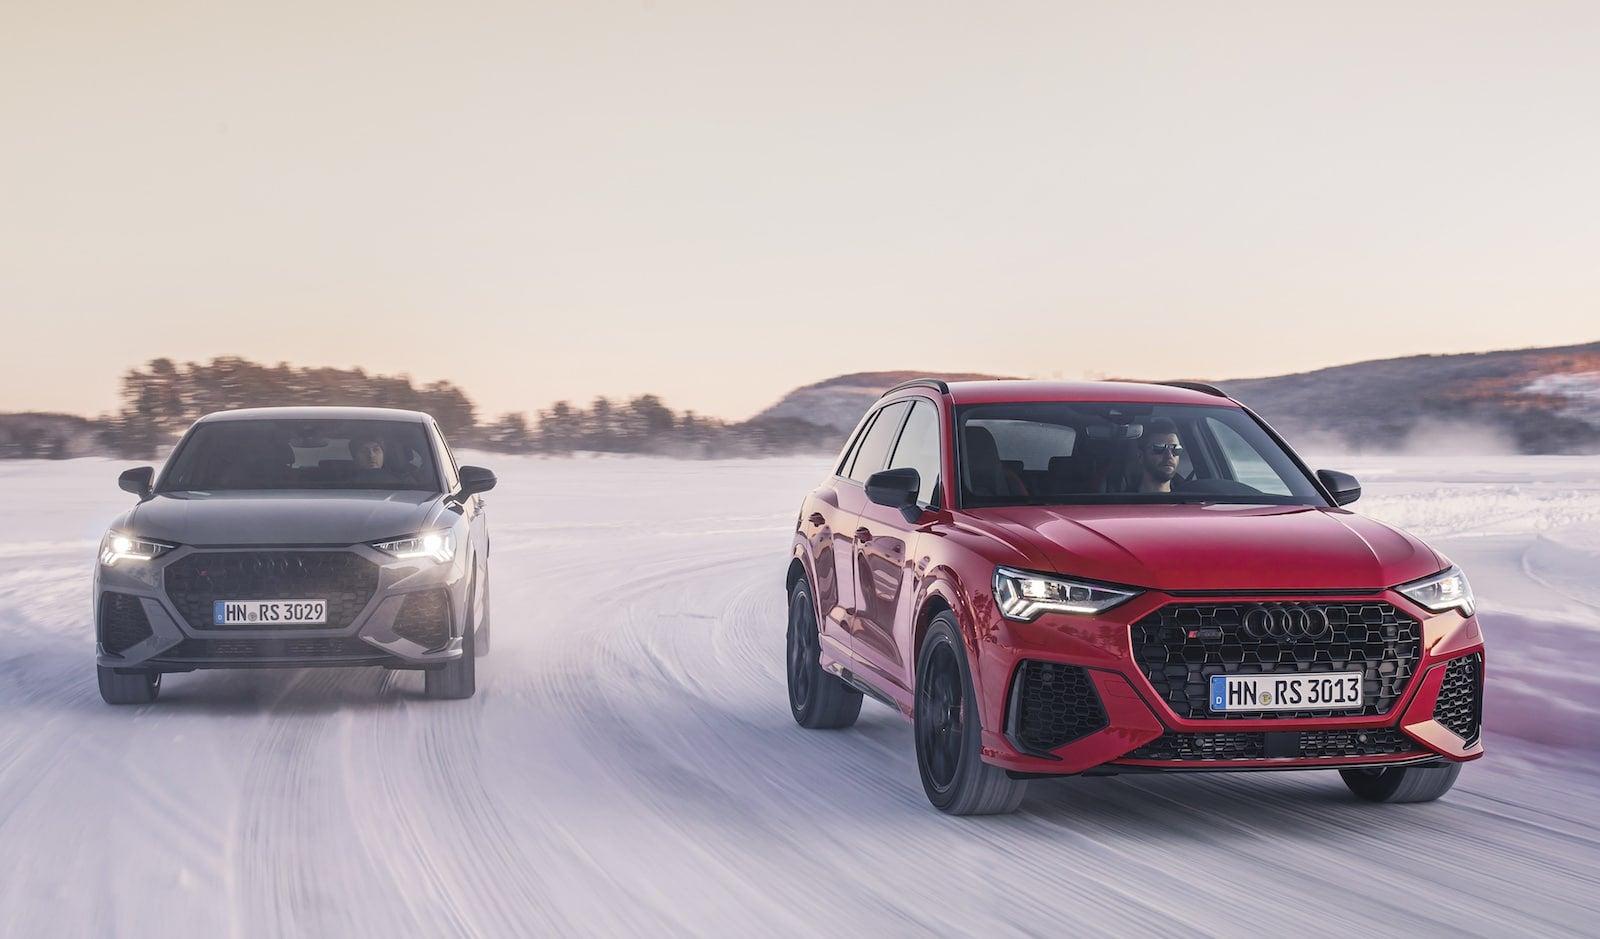 Audi Updates Rs Q3 And Rs Q3 Sportback For 2020 The Detroit Bureau